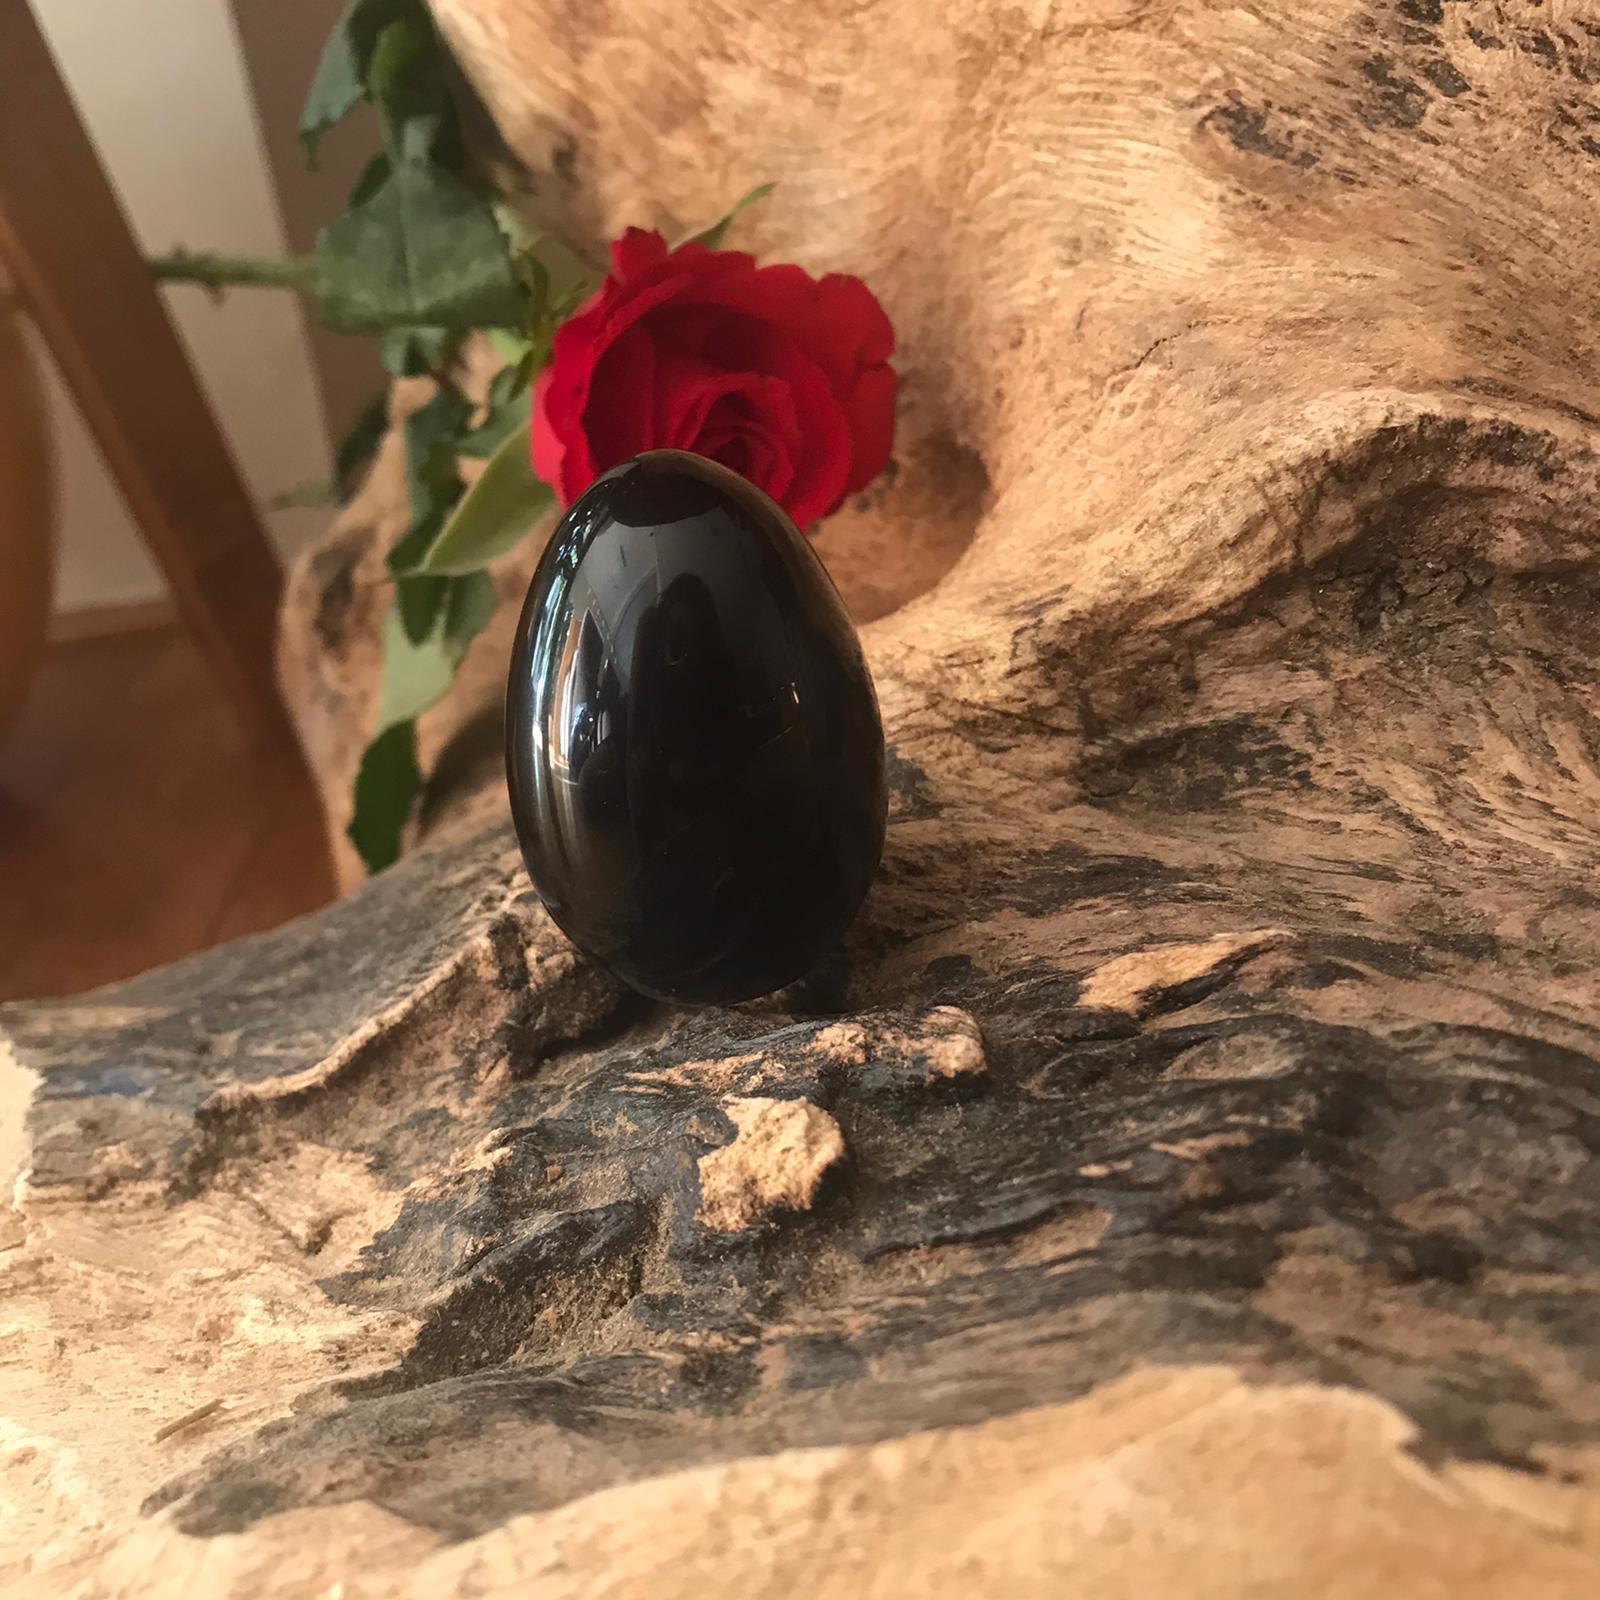 Ovo Yoni de Obsidiana Negra (yoni egg) - 3inBalance